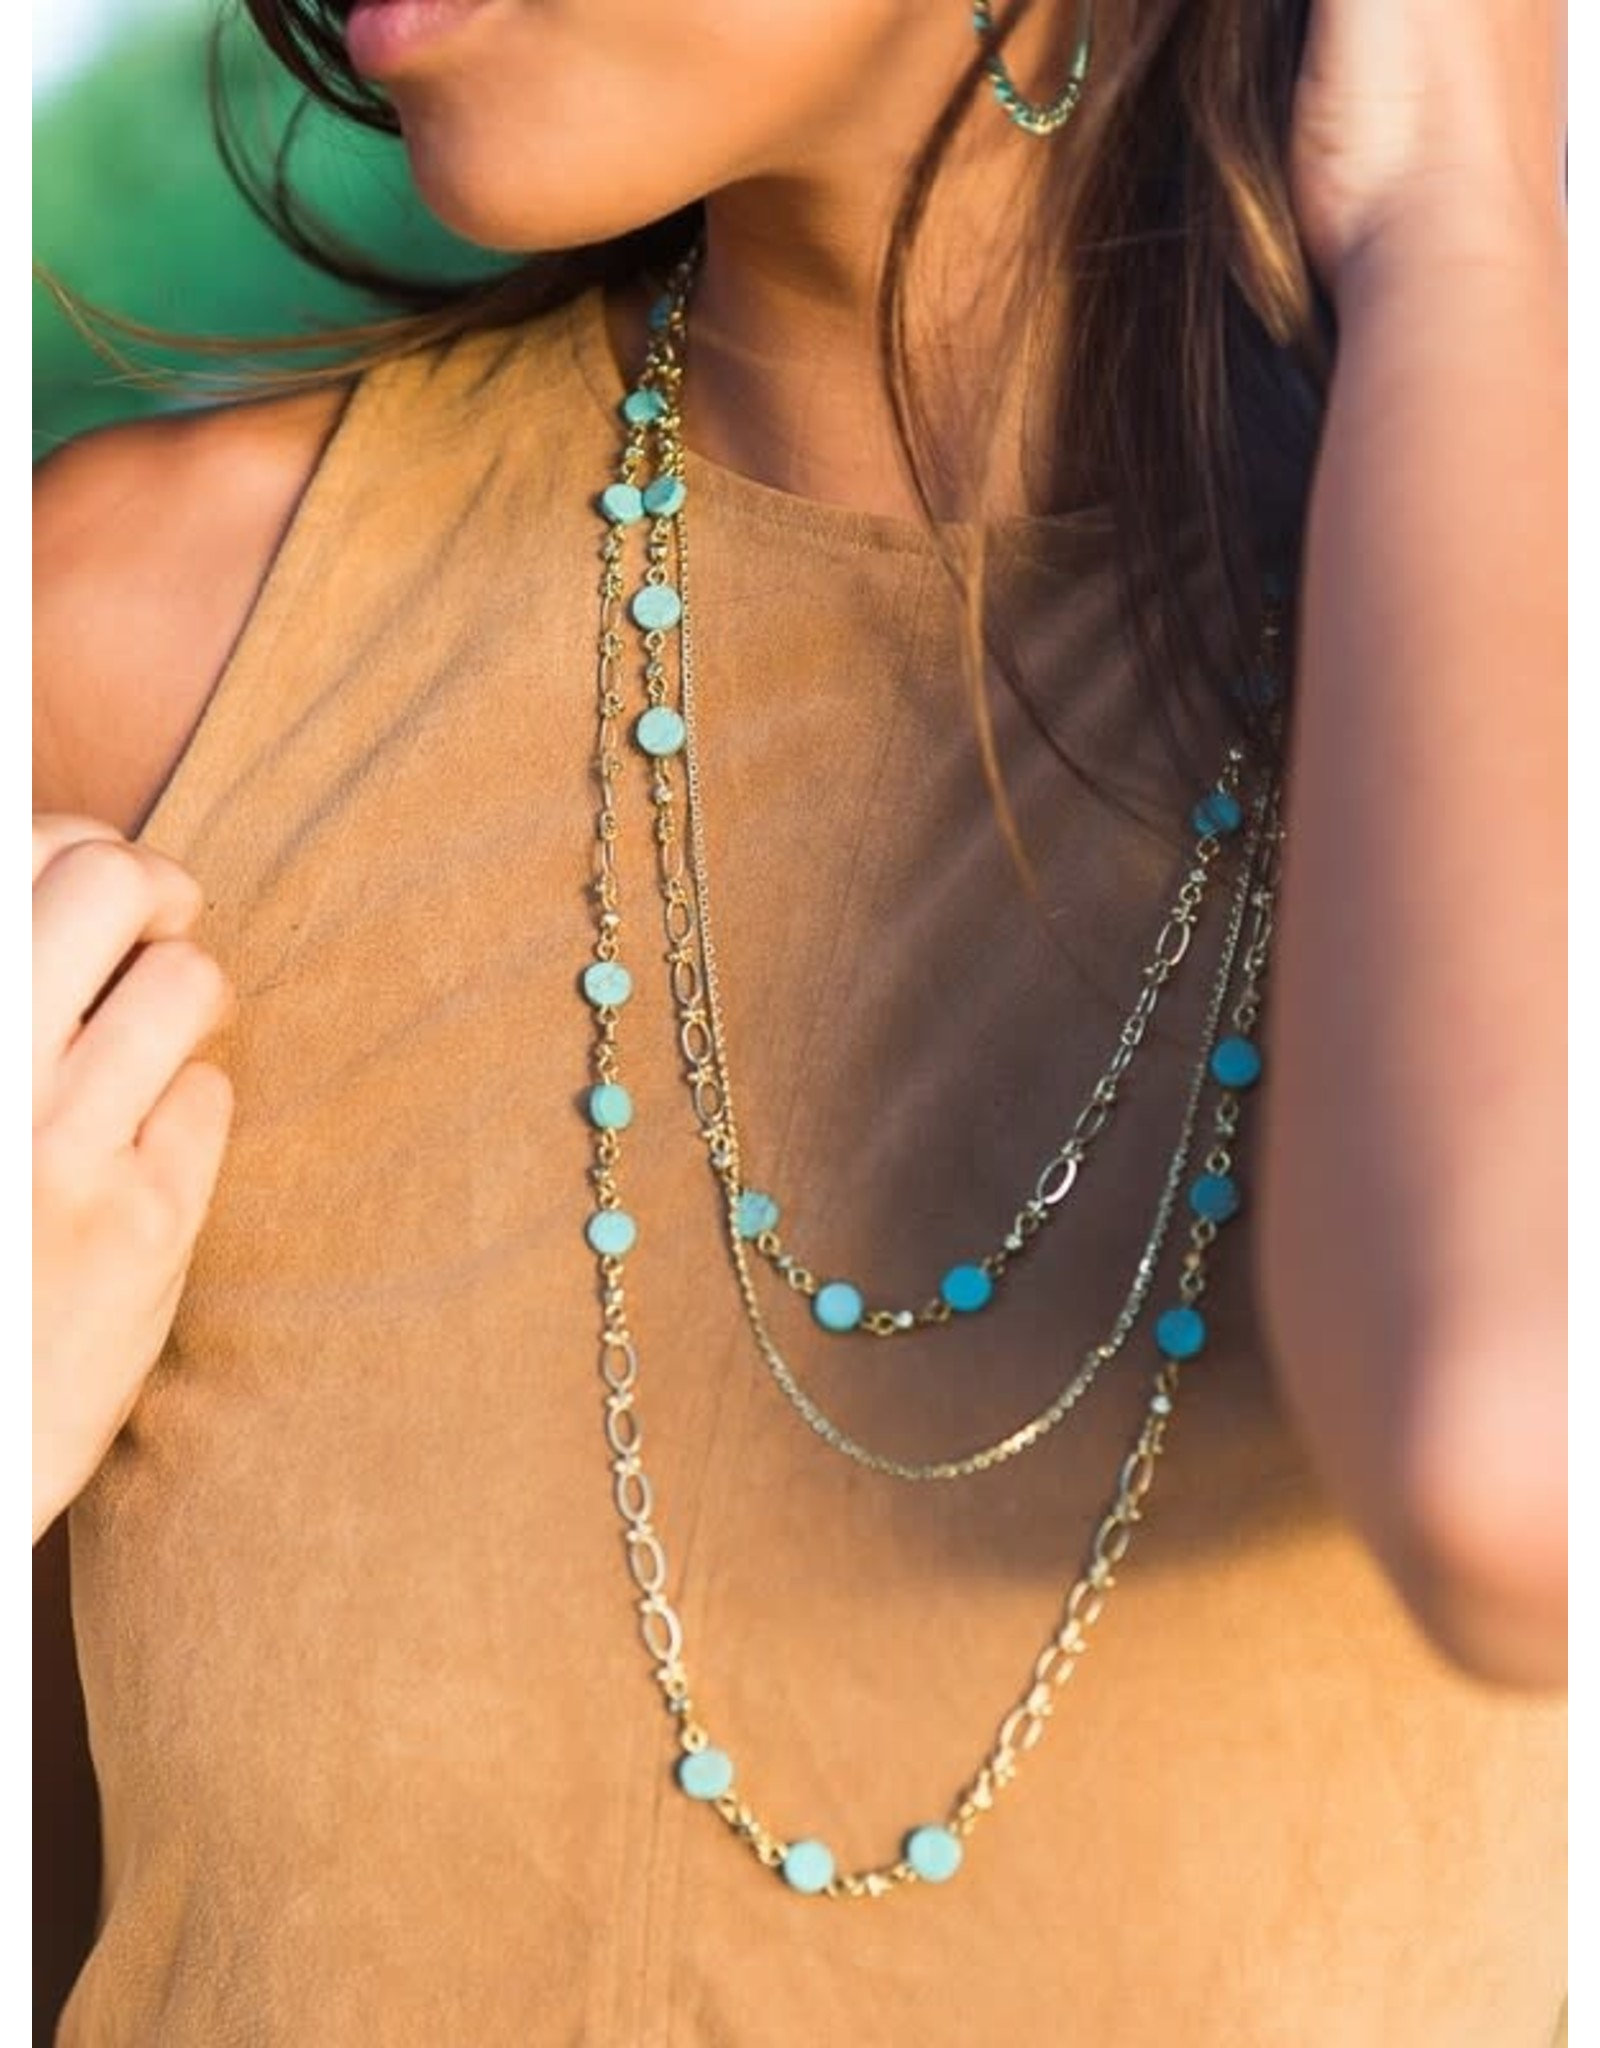 Synchronicity Multi Strand Necklace, India